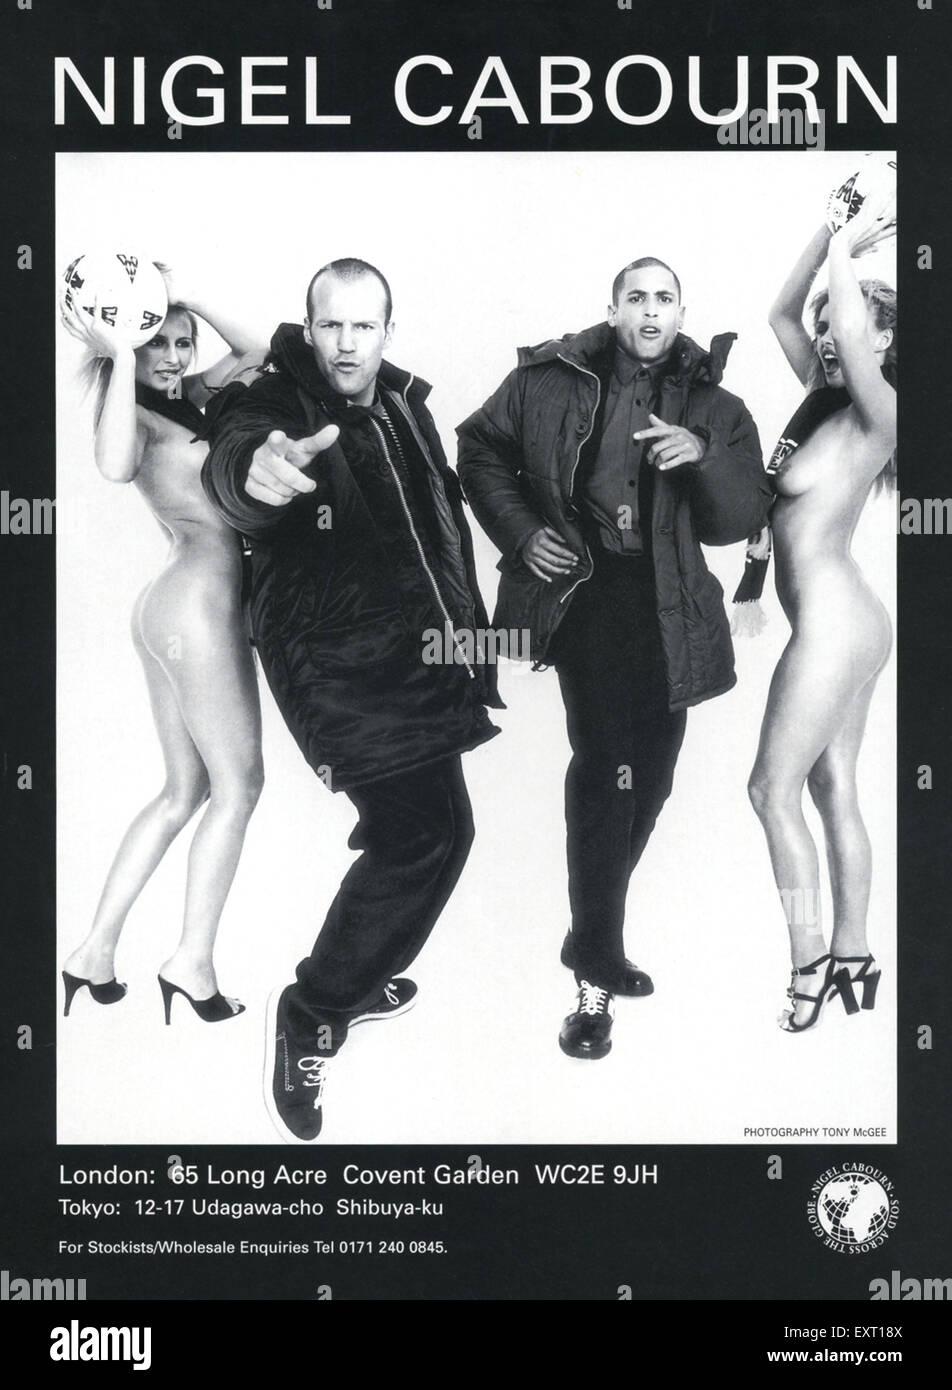 1990s UK Nigel Cabourn Magazine Advert - Stock Image